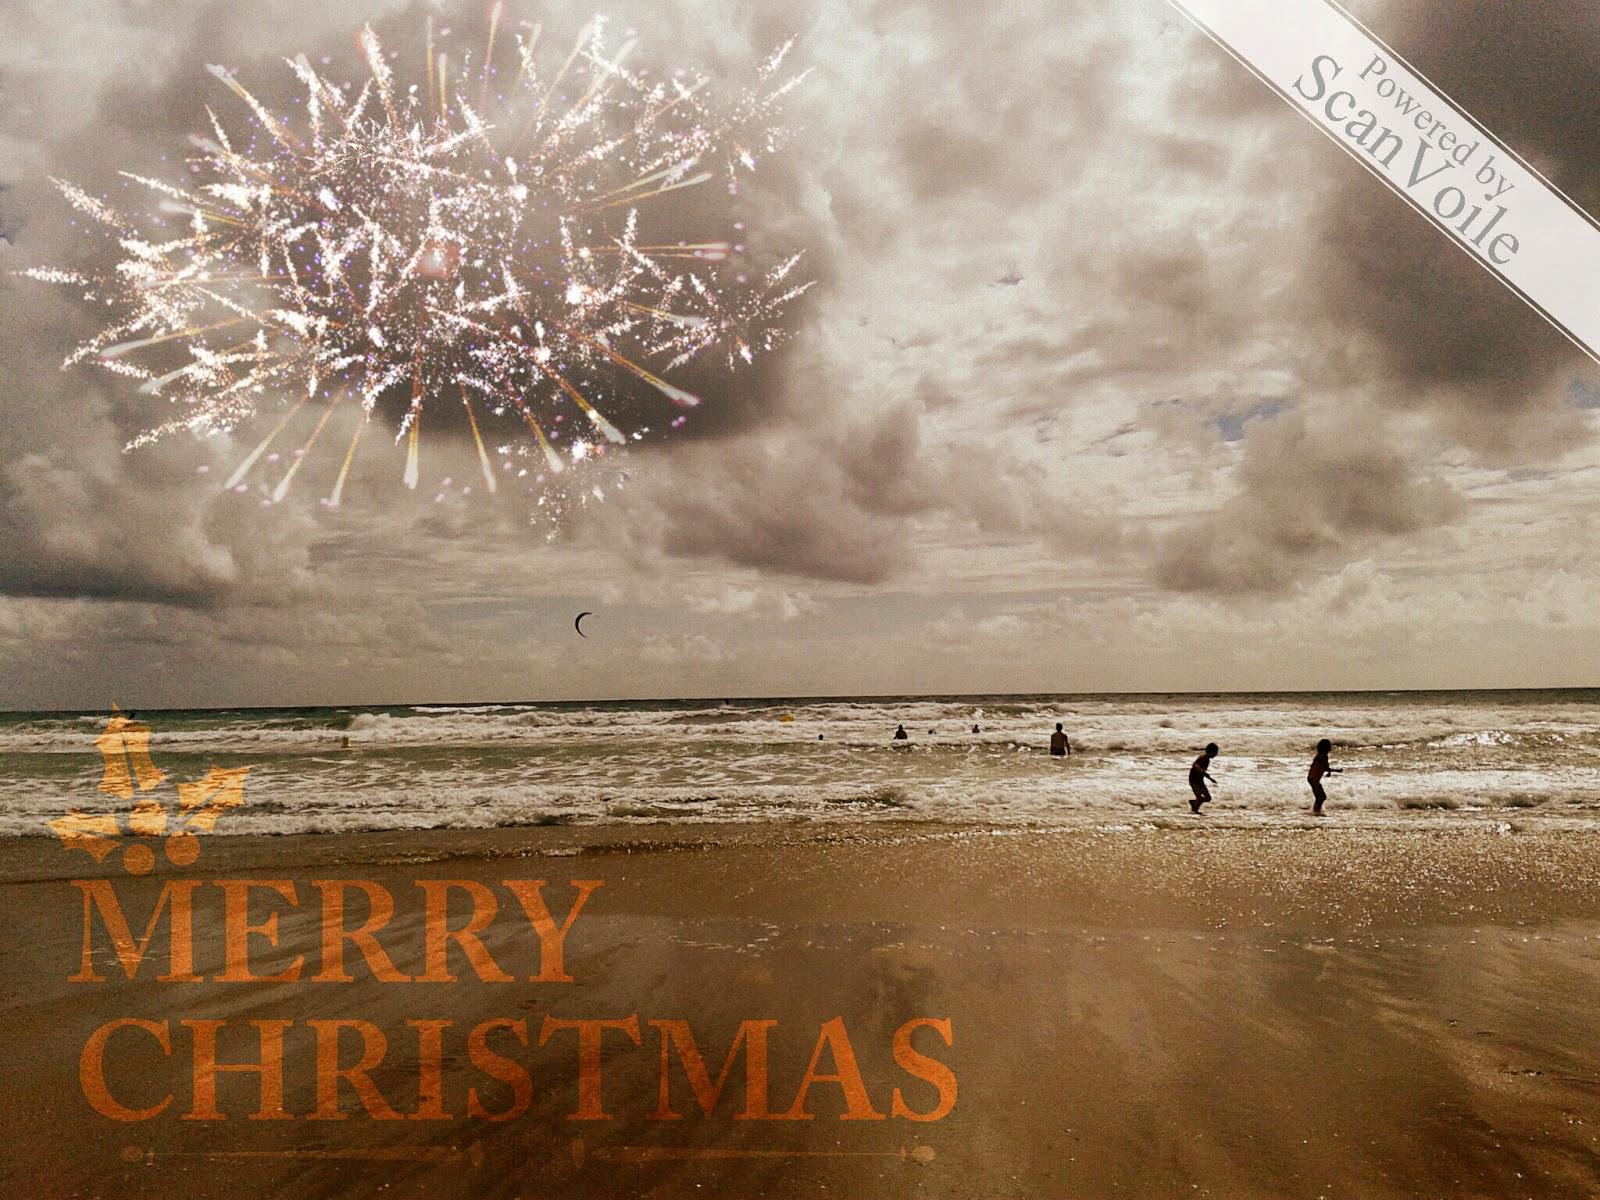 Joyeux Noël à Tous ! Merry Christmas !